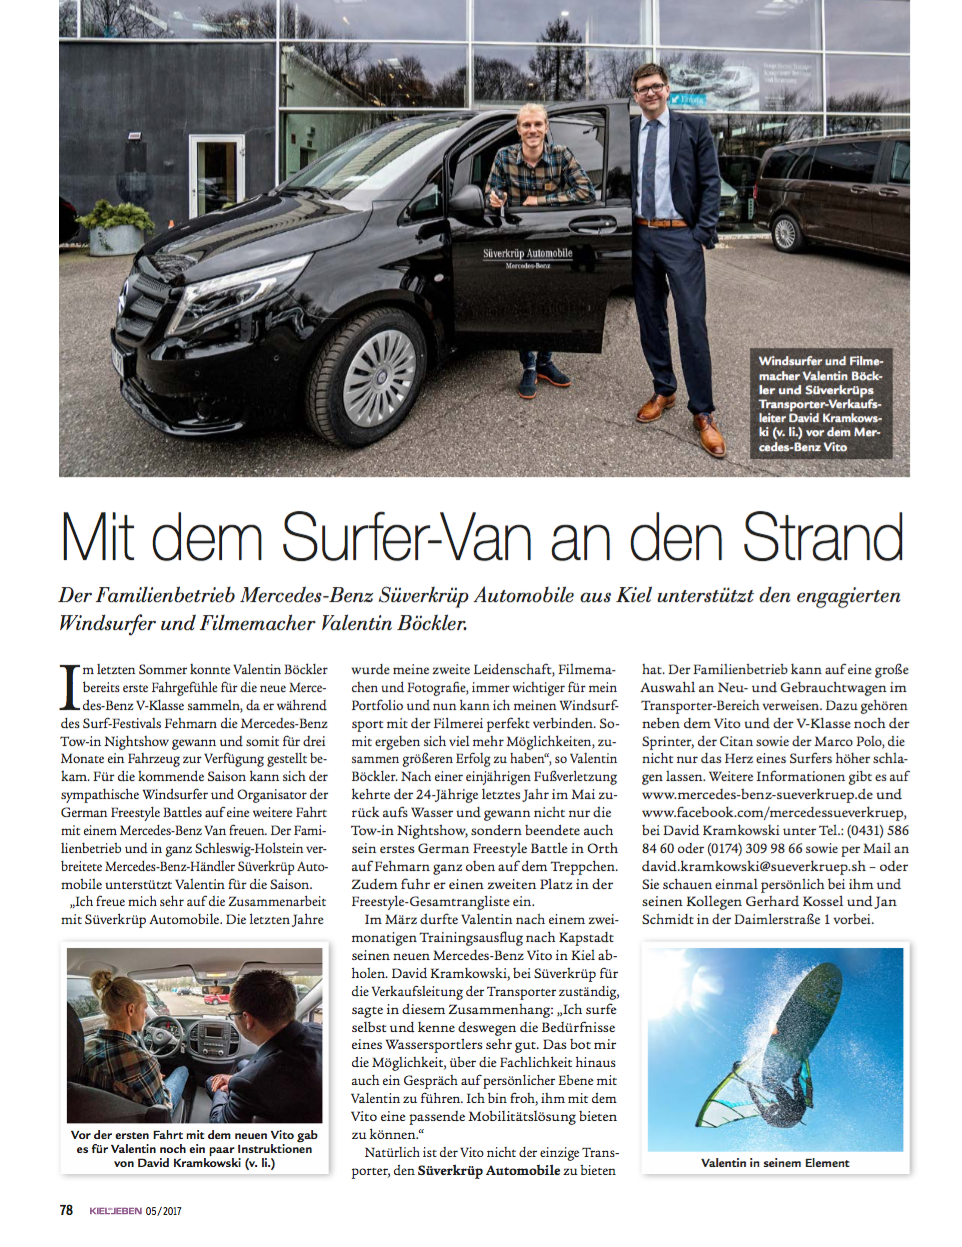 KielErLeben Süverkrüp Automobile Kooperation